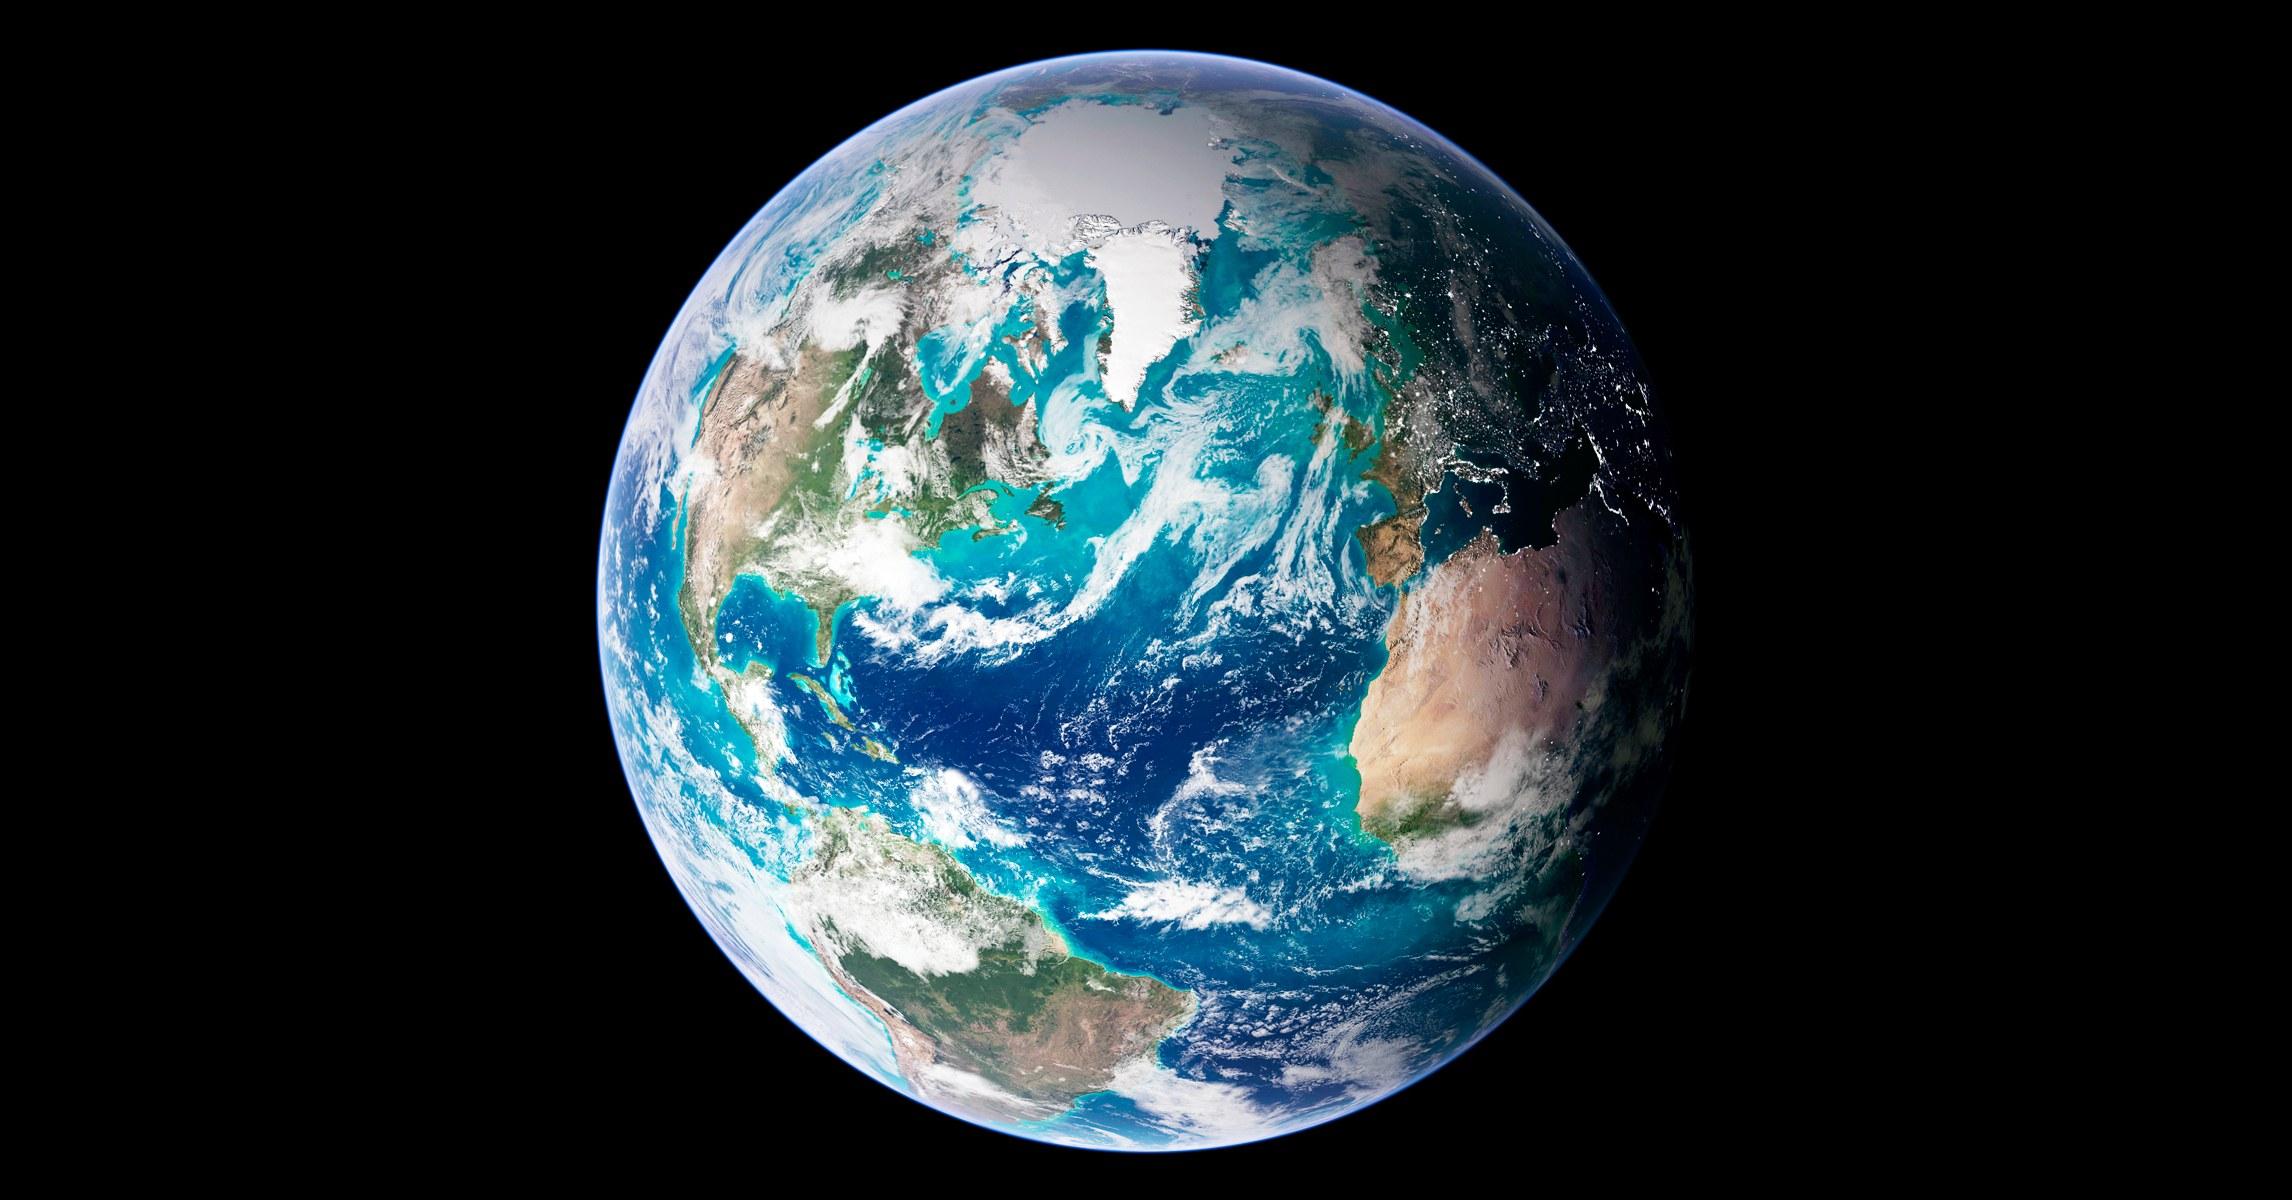 earthspace_featuredart-85757273